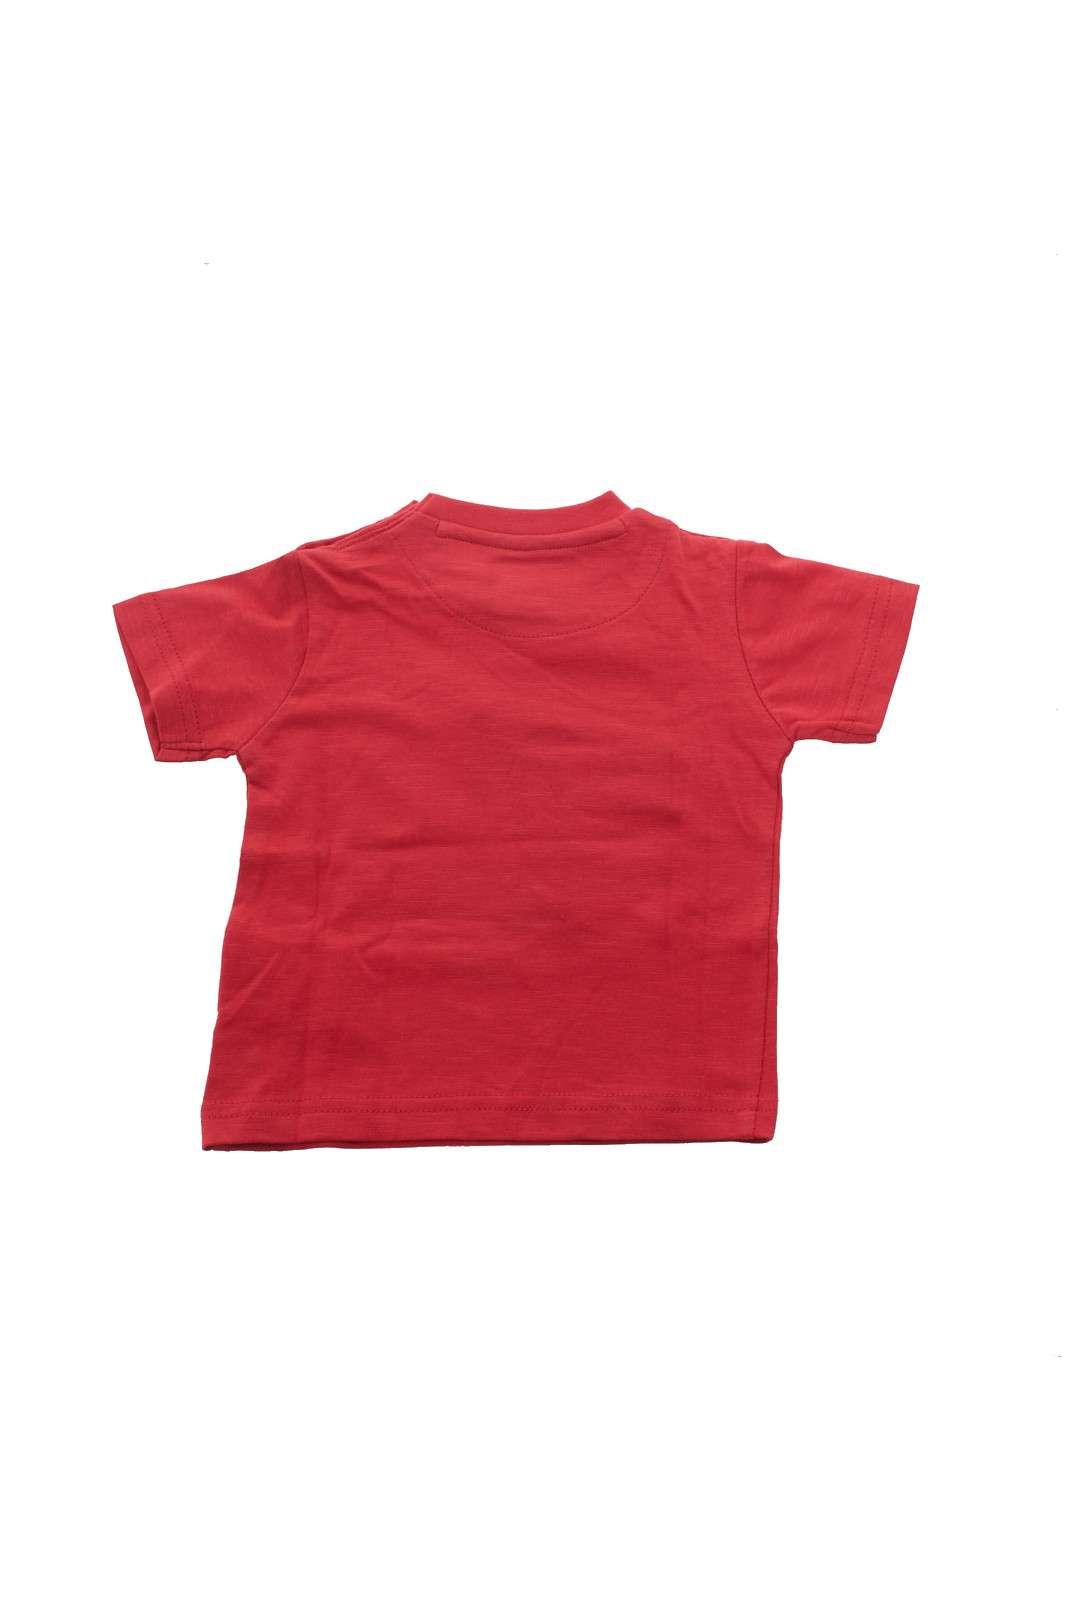 https://www.parmax.com/media/catalog/product/a/i/PE-outlet_parmax-t-shirt-bambino-Aspen-20022020-B.jpg